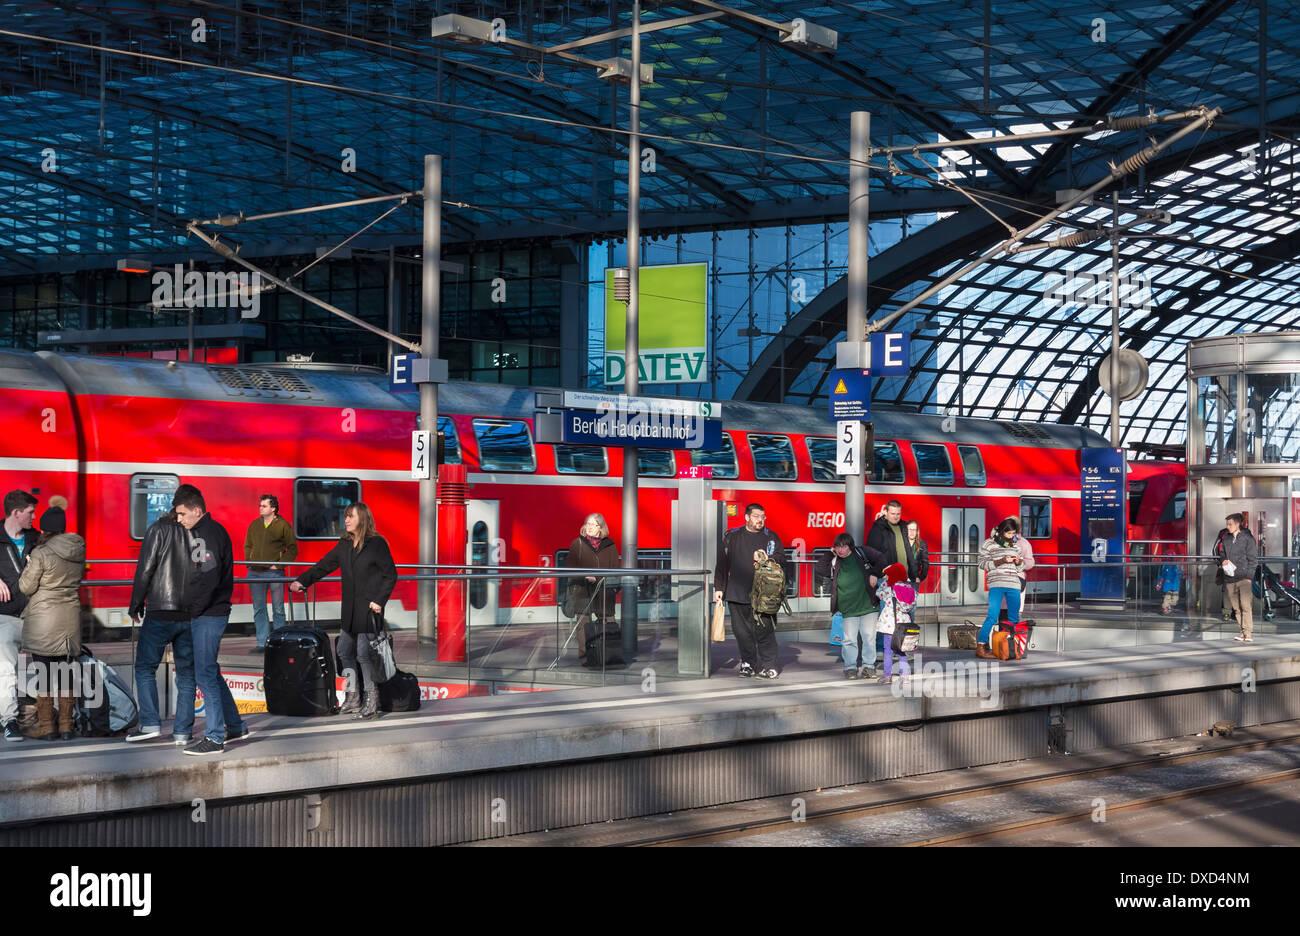 Train platform in Hauptbahnhof railway station, Berlin, Germany, Europe - Stock Image